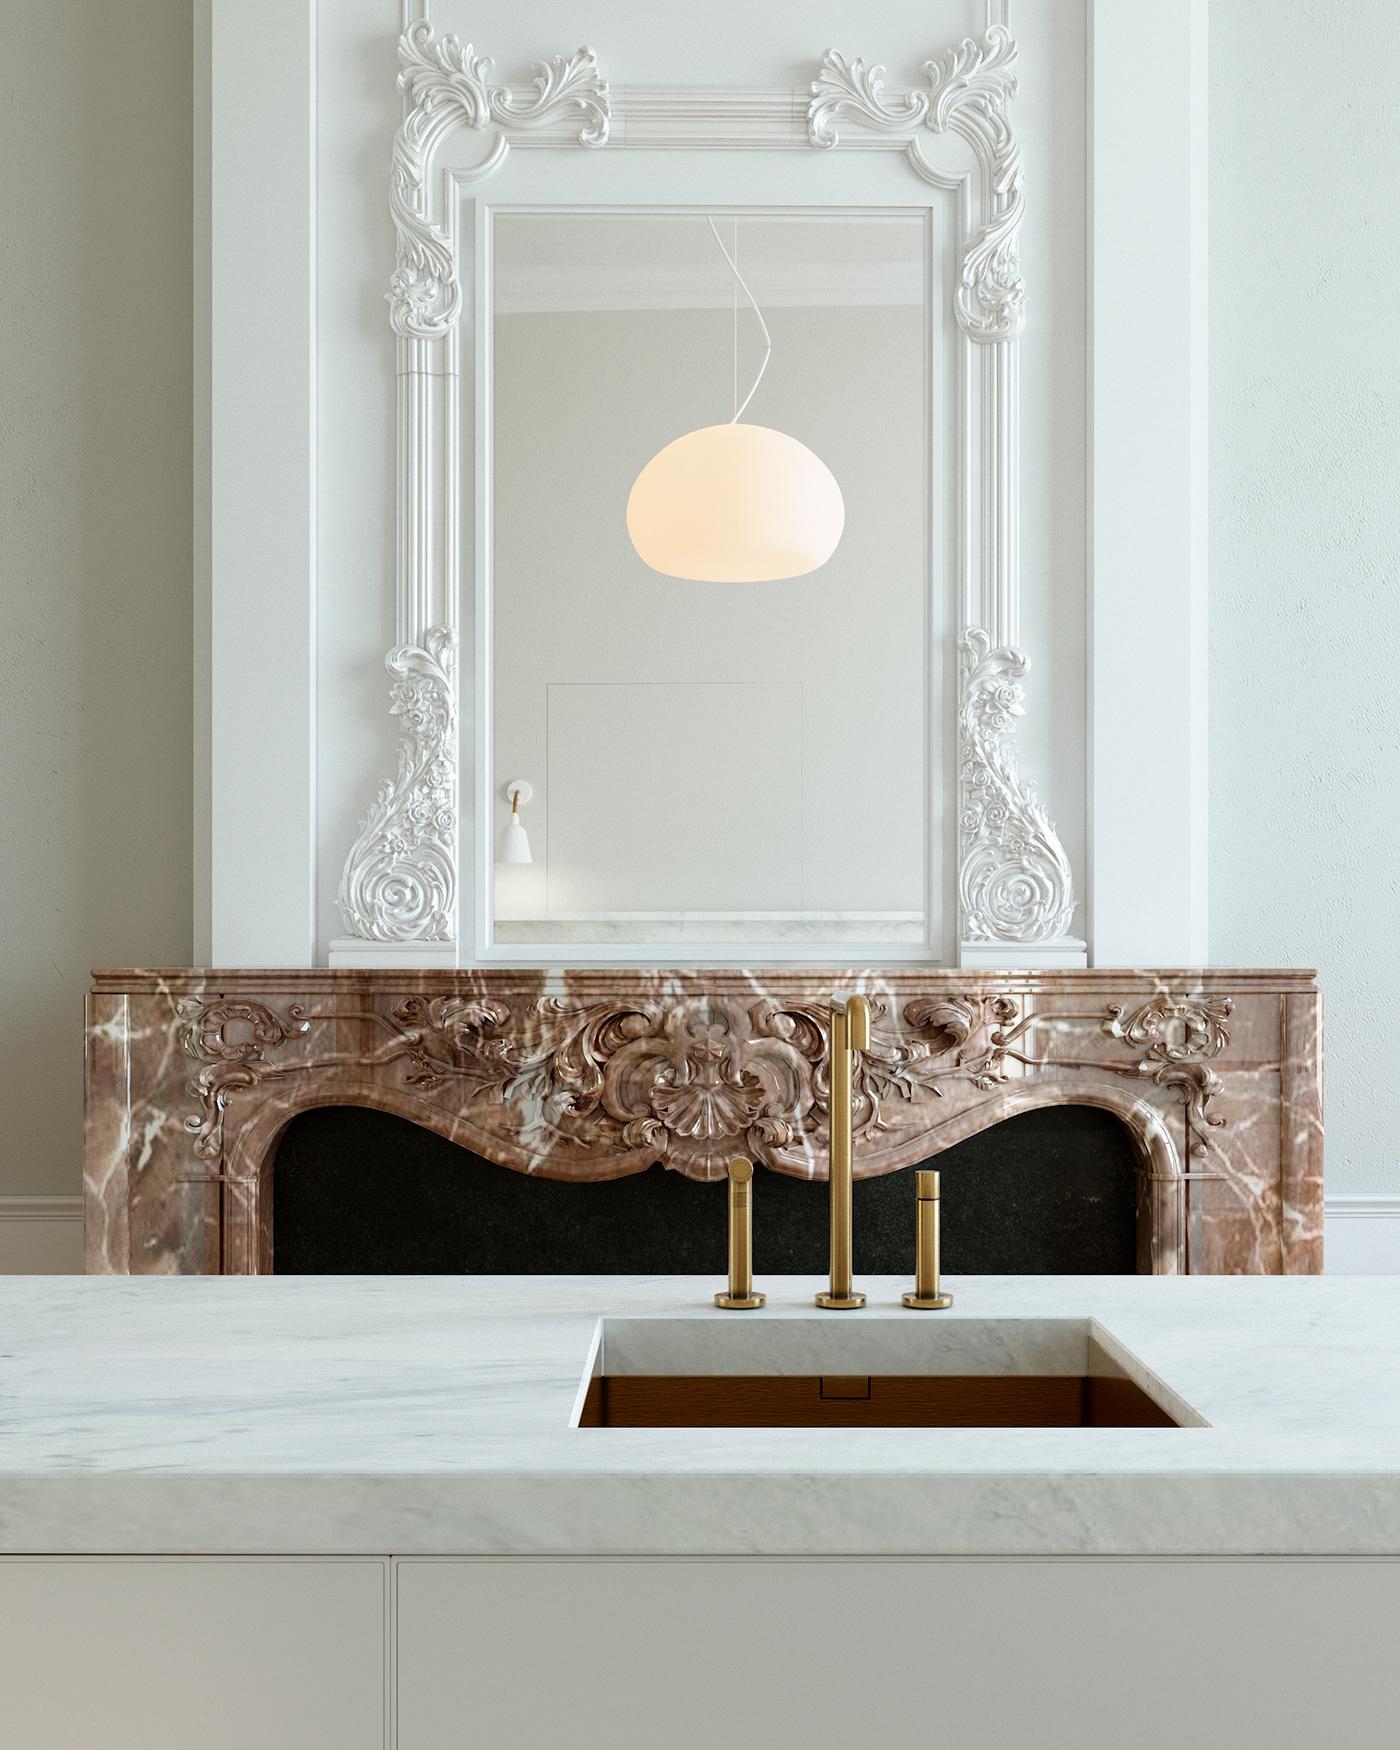 amsterdam,architecture,design,house,Interior,interiordesign,midcentury,Scandinavian